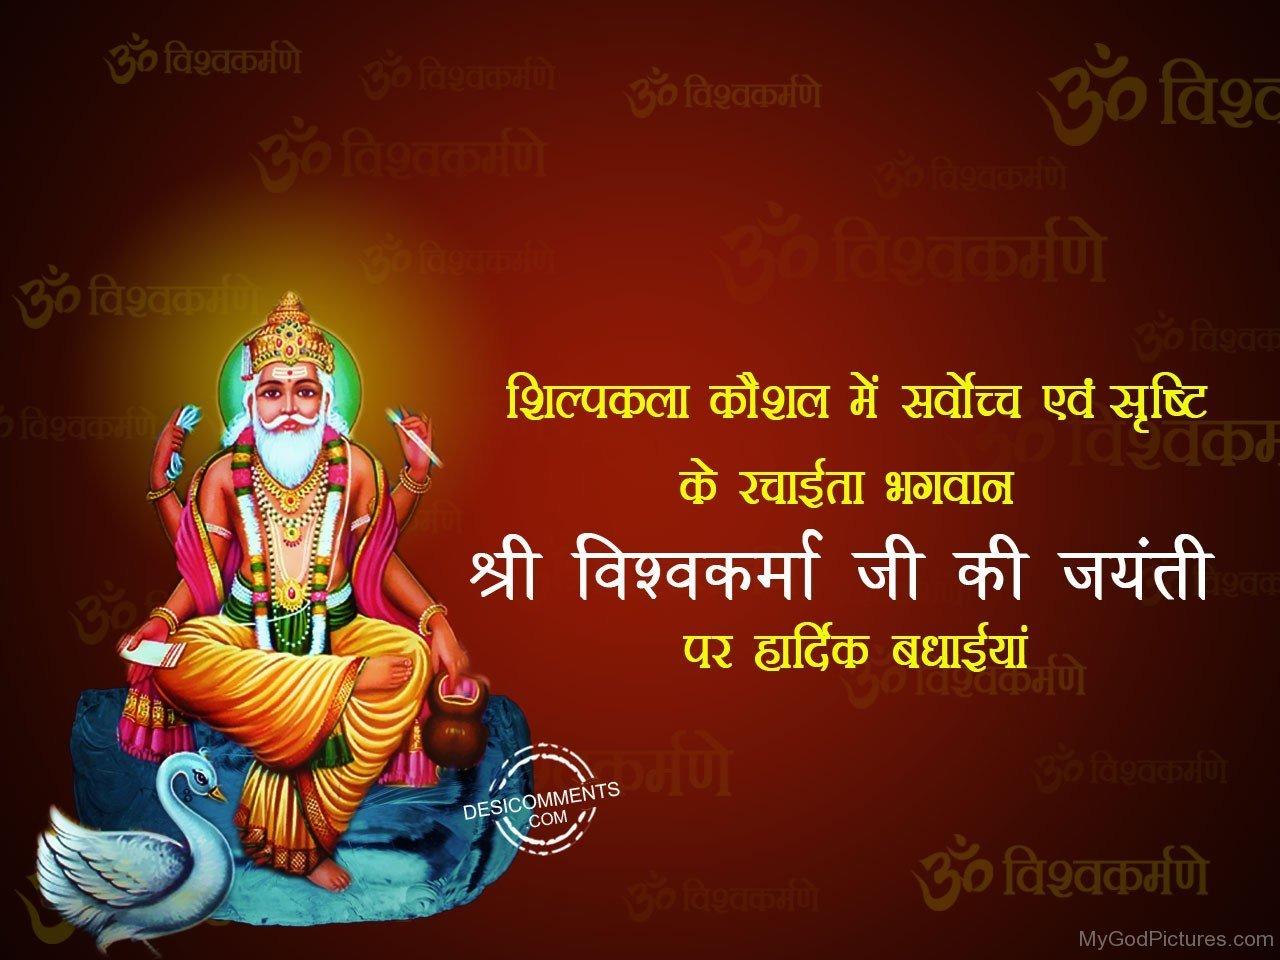 Most Inspiring Wallpaper Lord Vishwakarma - Shilap-kala-kaushal-me-sarvouch  You Should Have_546727.jpg